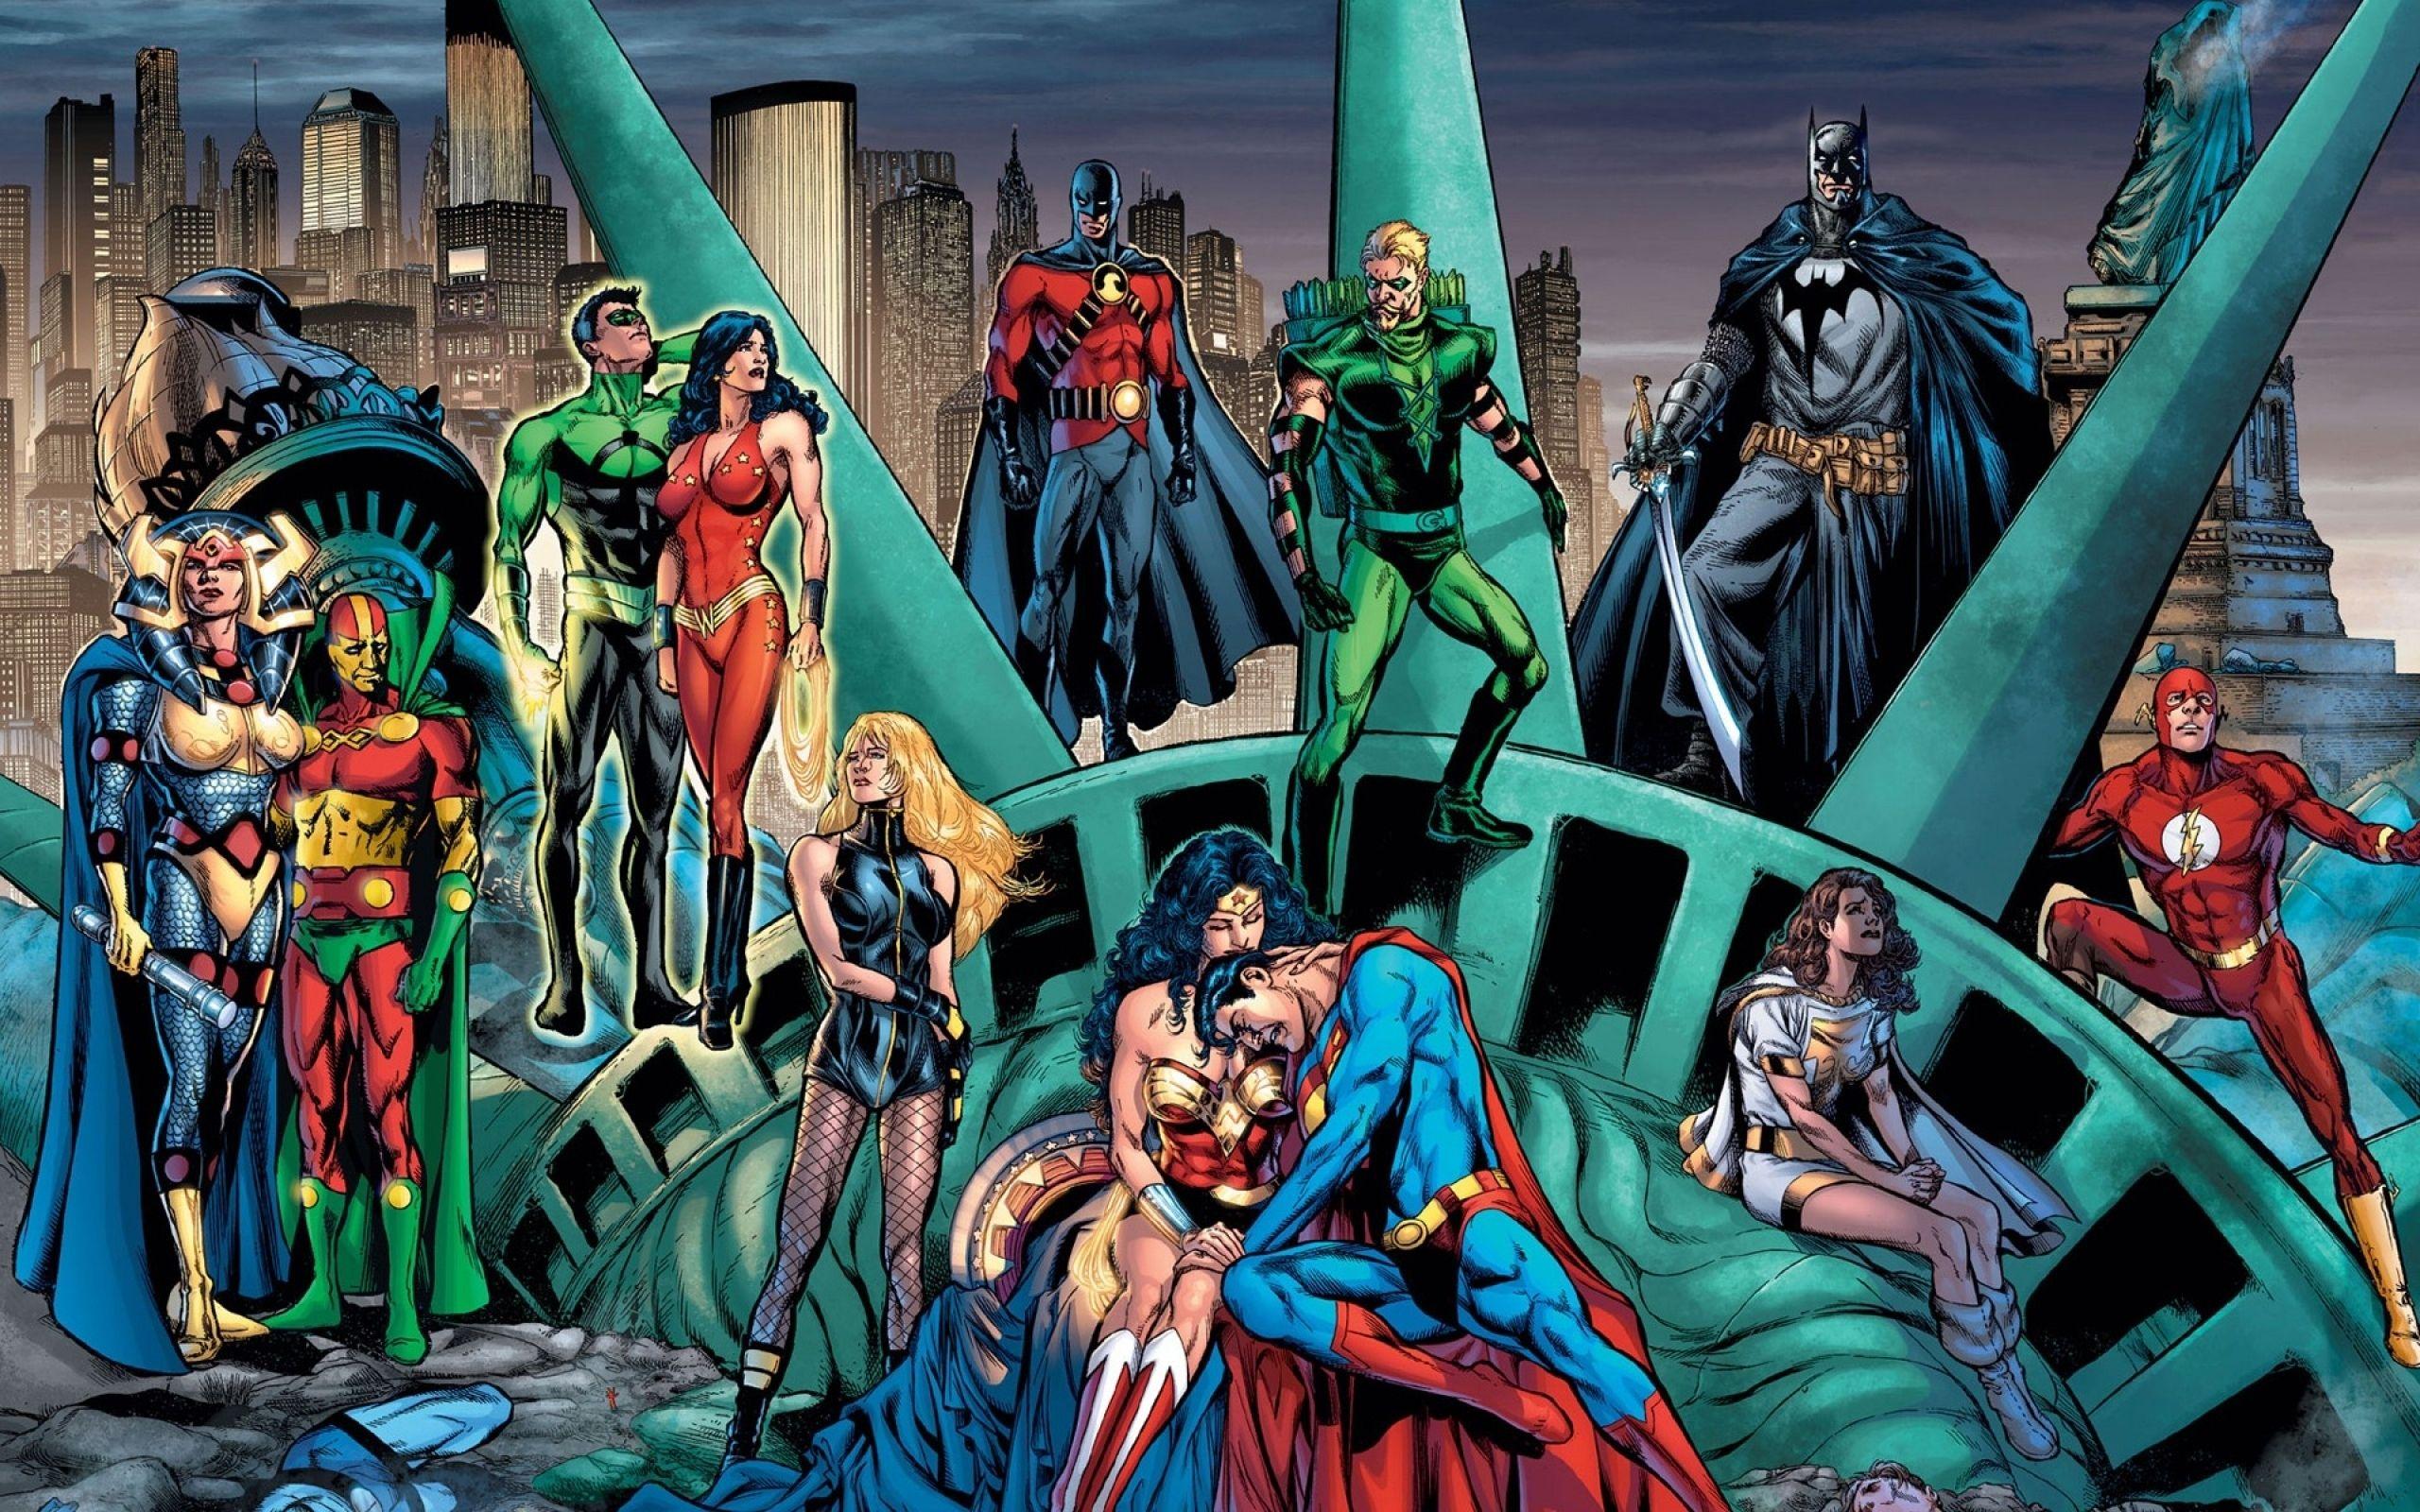 Justice League Computer Wallpapers Desktop Backgrounds 2560x1600 Id 221832 Dc Comics Wallpaper Comic Poster Superhero Comic